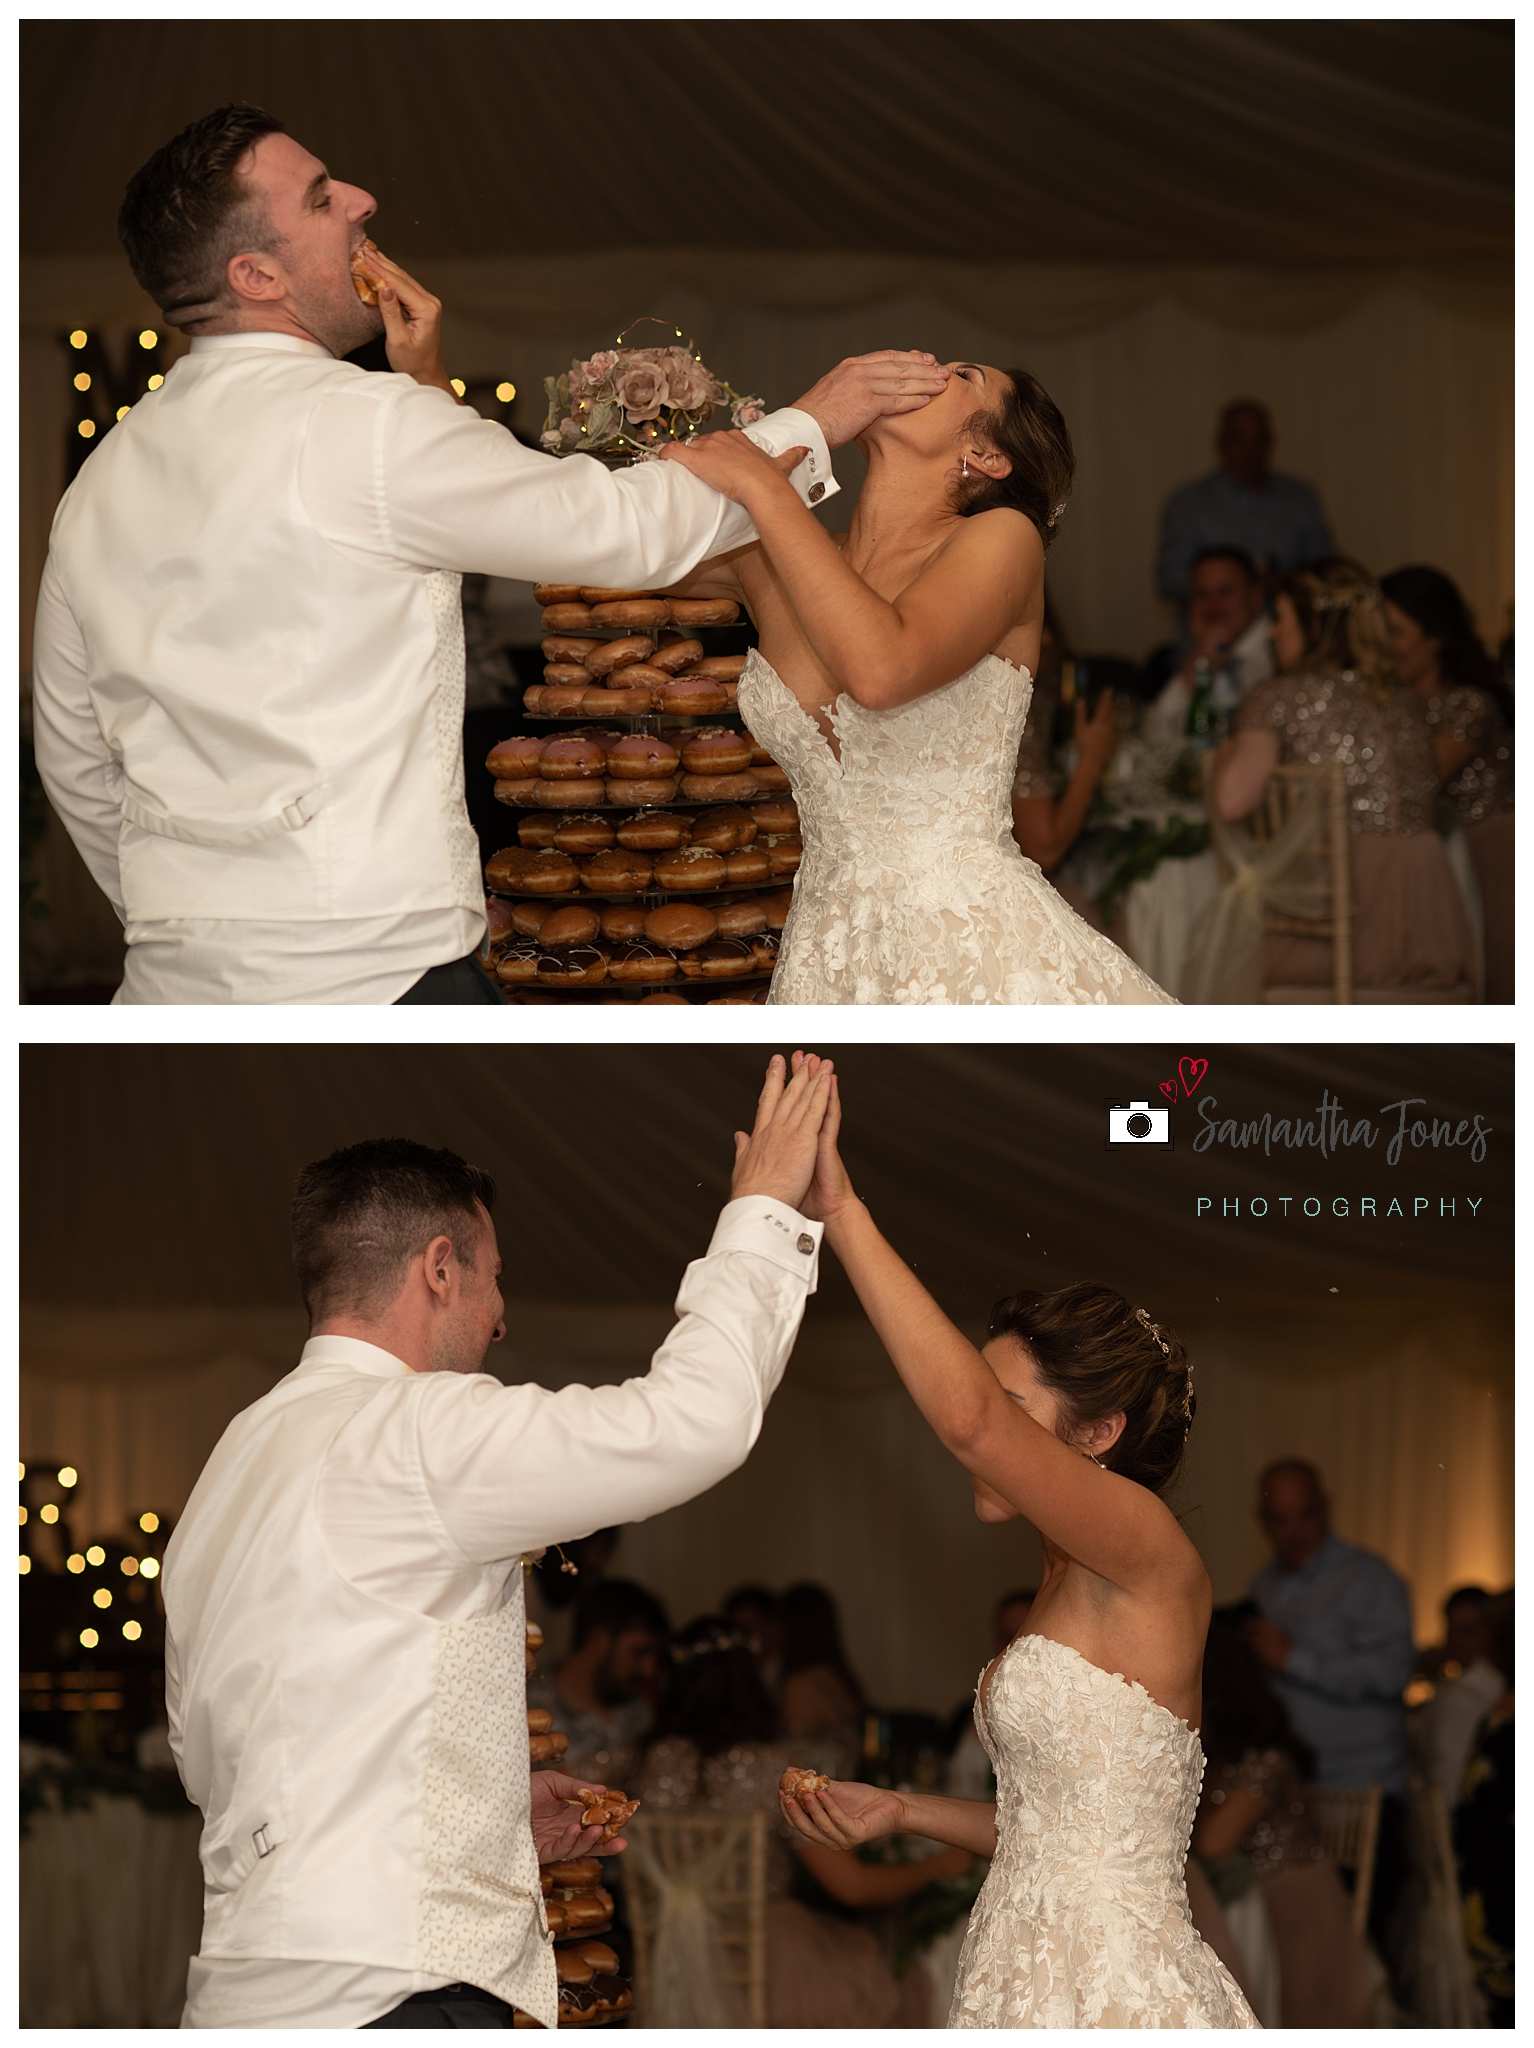 Krispy Kremes bride and groom September wedding non-traditional cake cuttin g